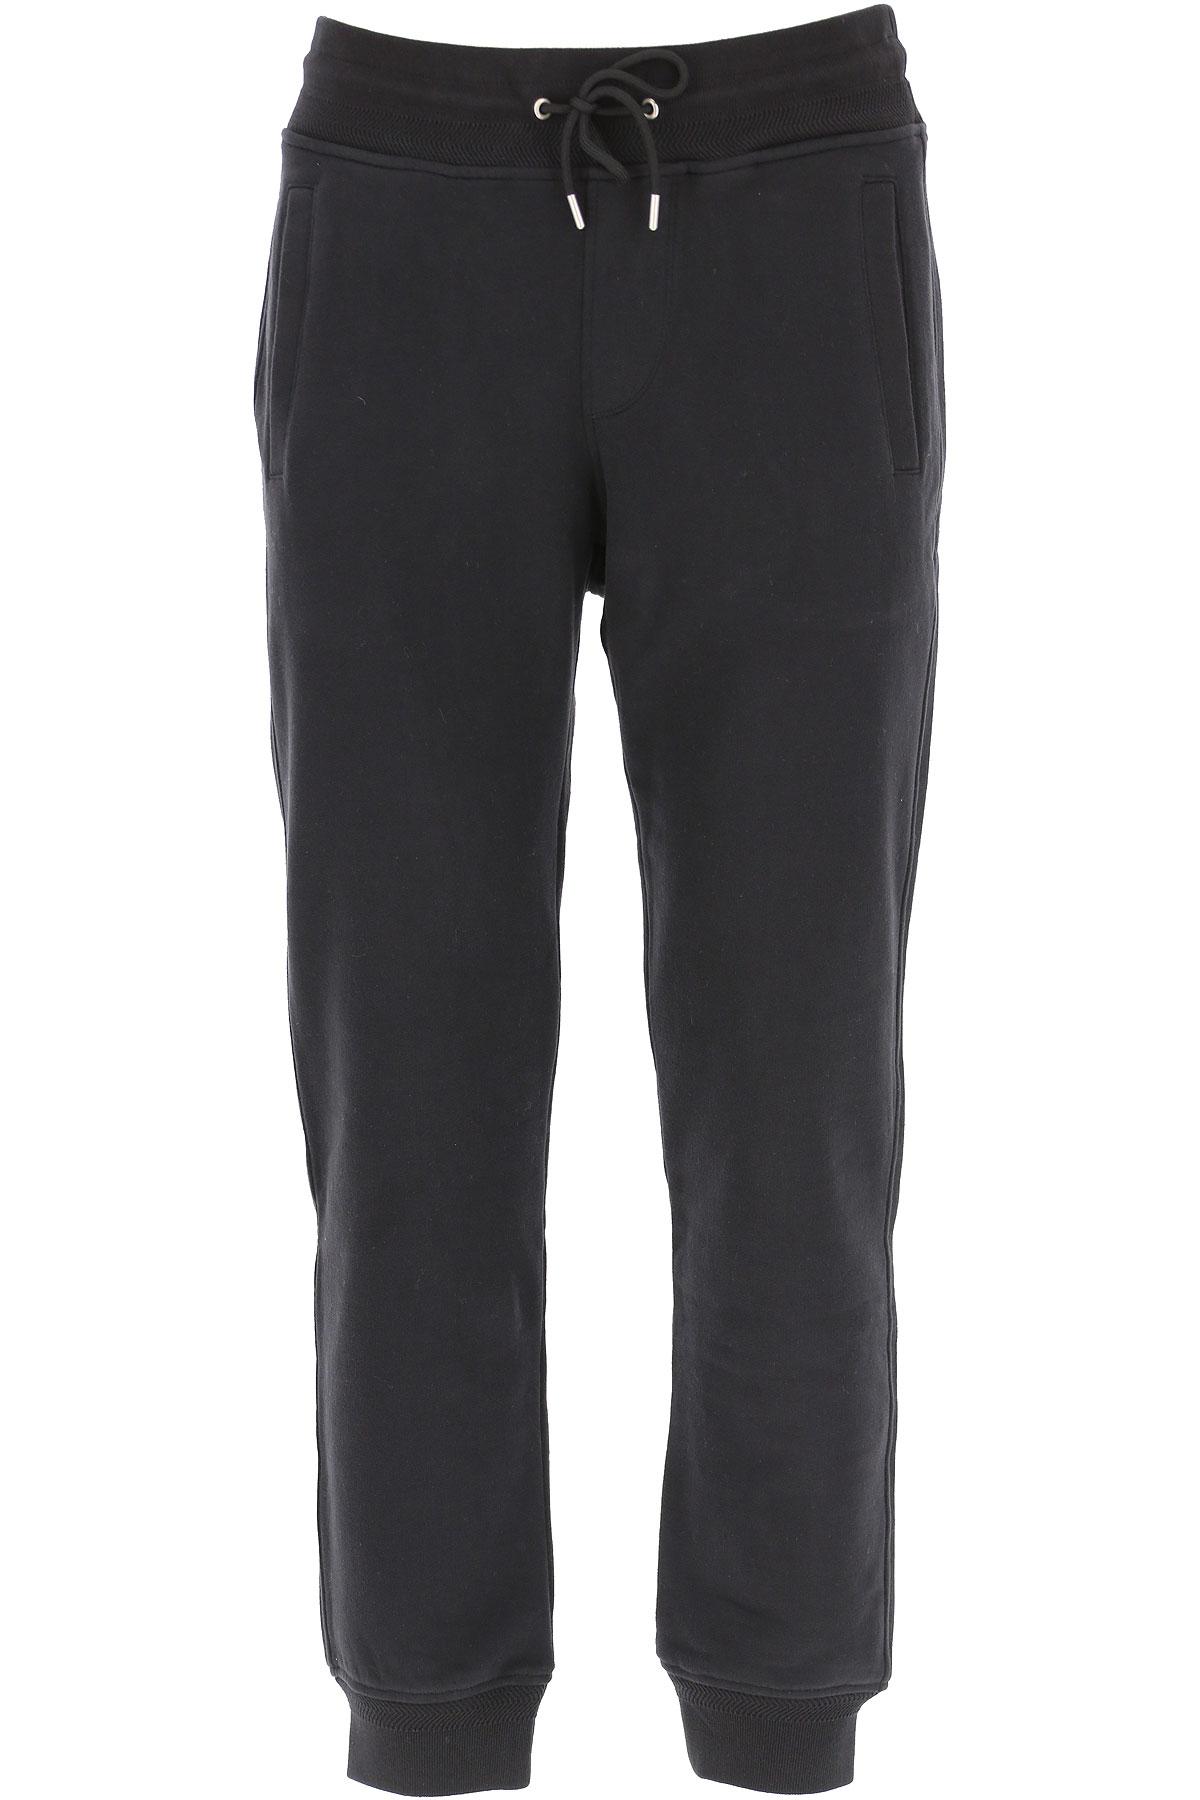 Belstaff Sweatpants On Sale, Black, Cotton, 2019, 30 32 34